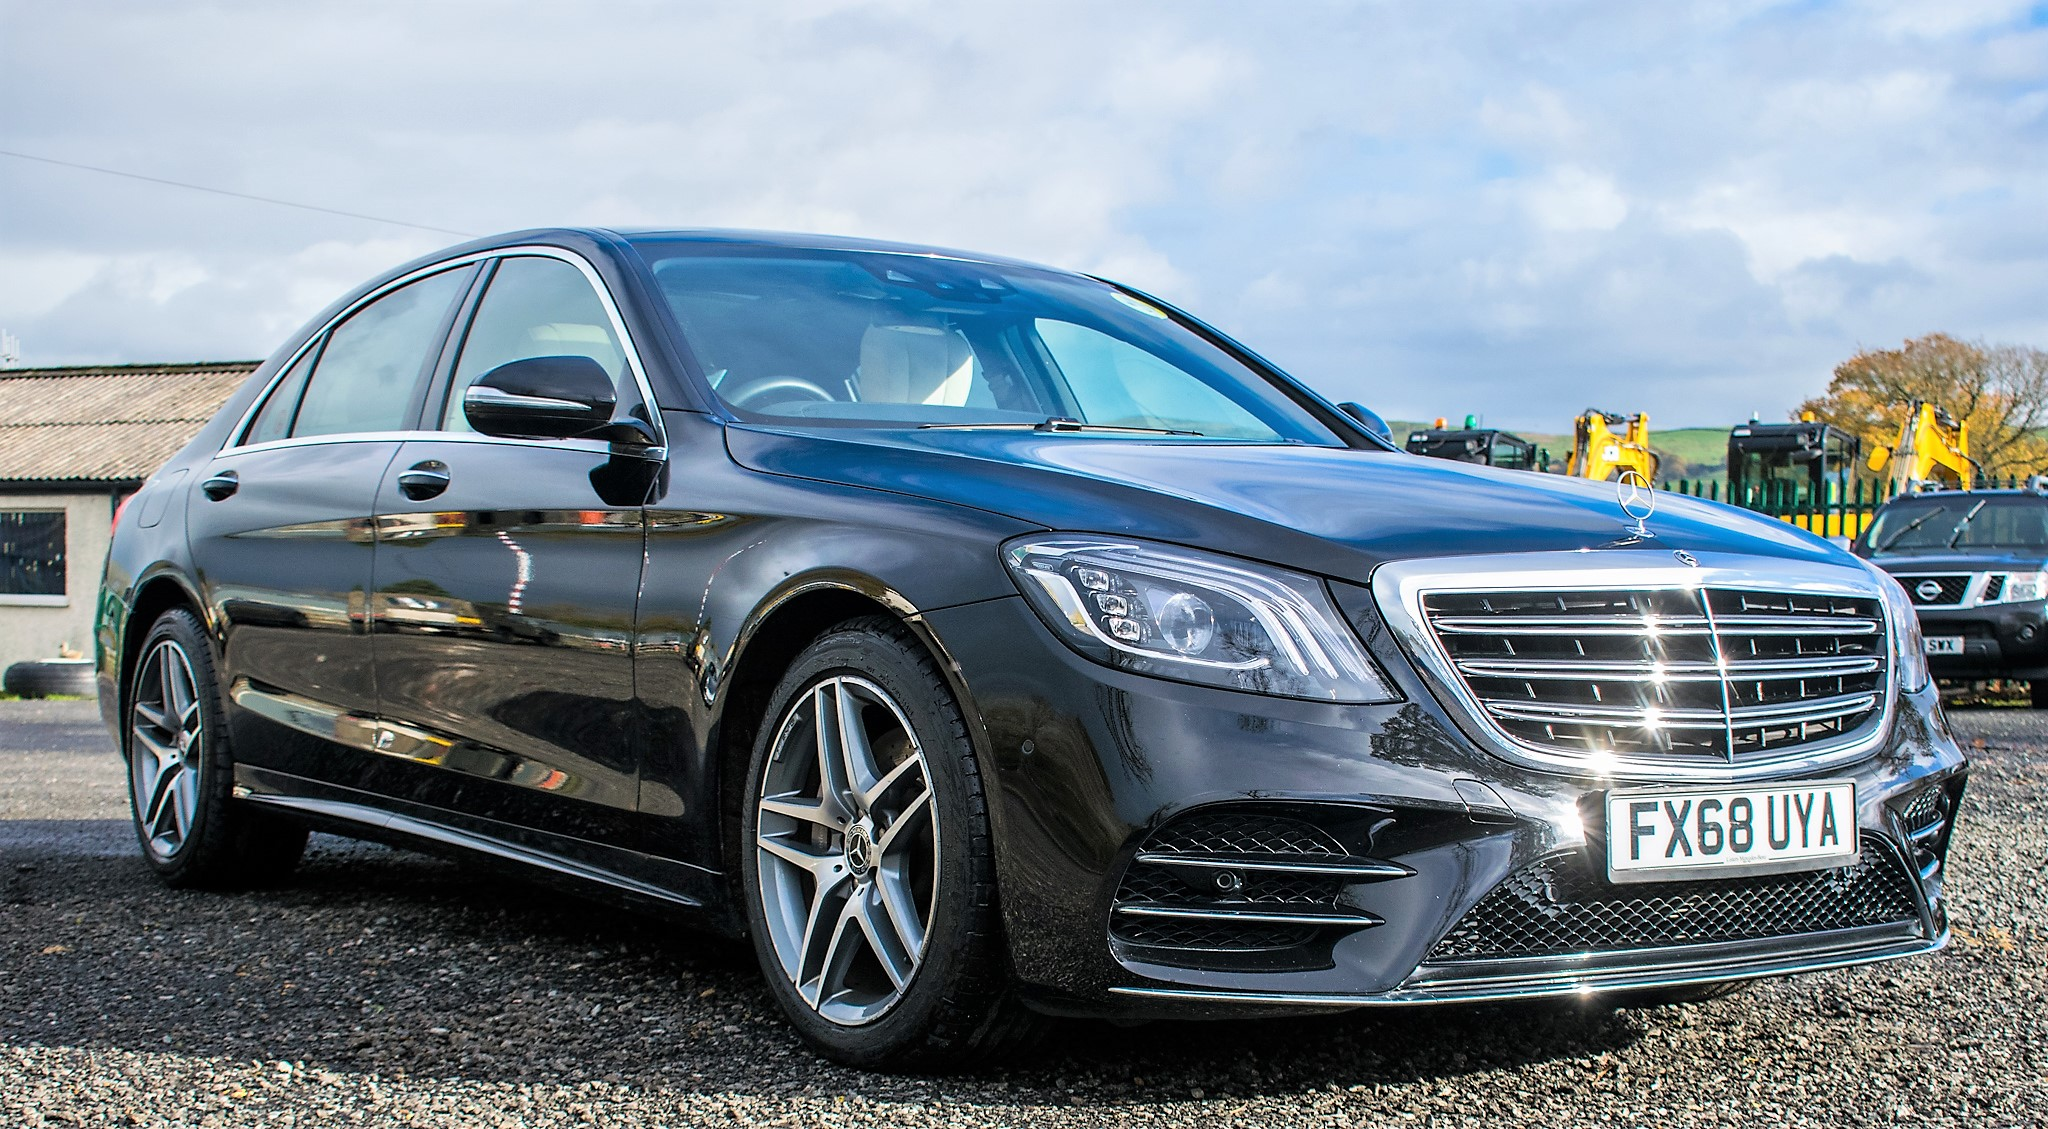 Mercedes Benz S450 L AMG Line Executive auto petrol 4 door saloon car Registration Number: FX68 - Image 2 of 30